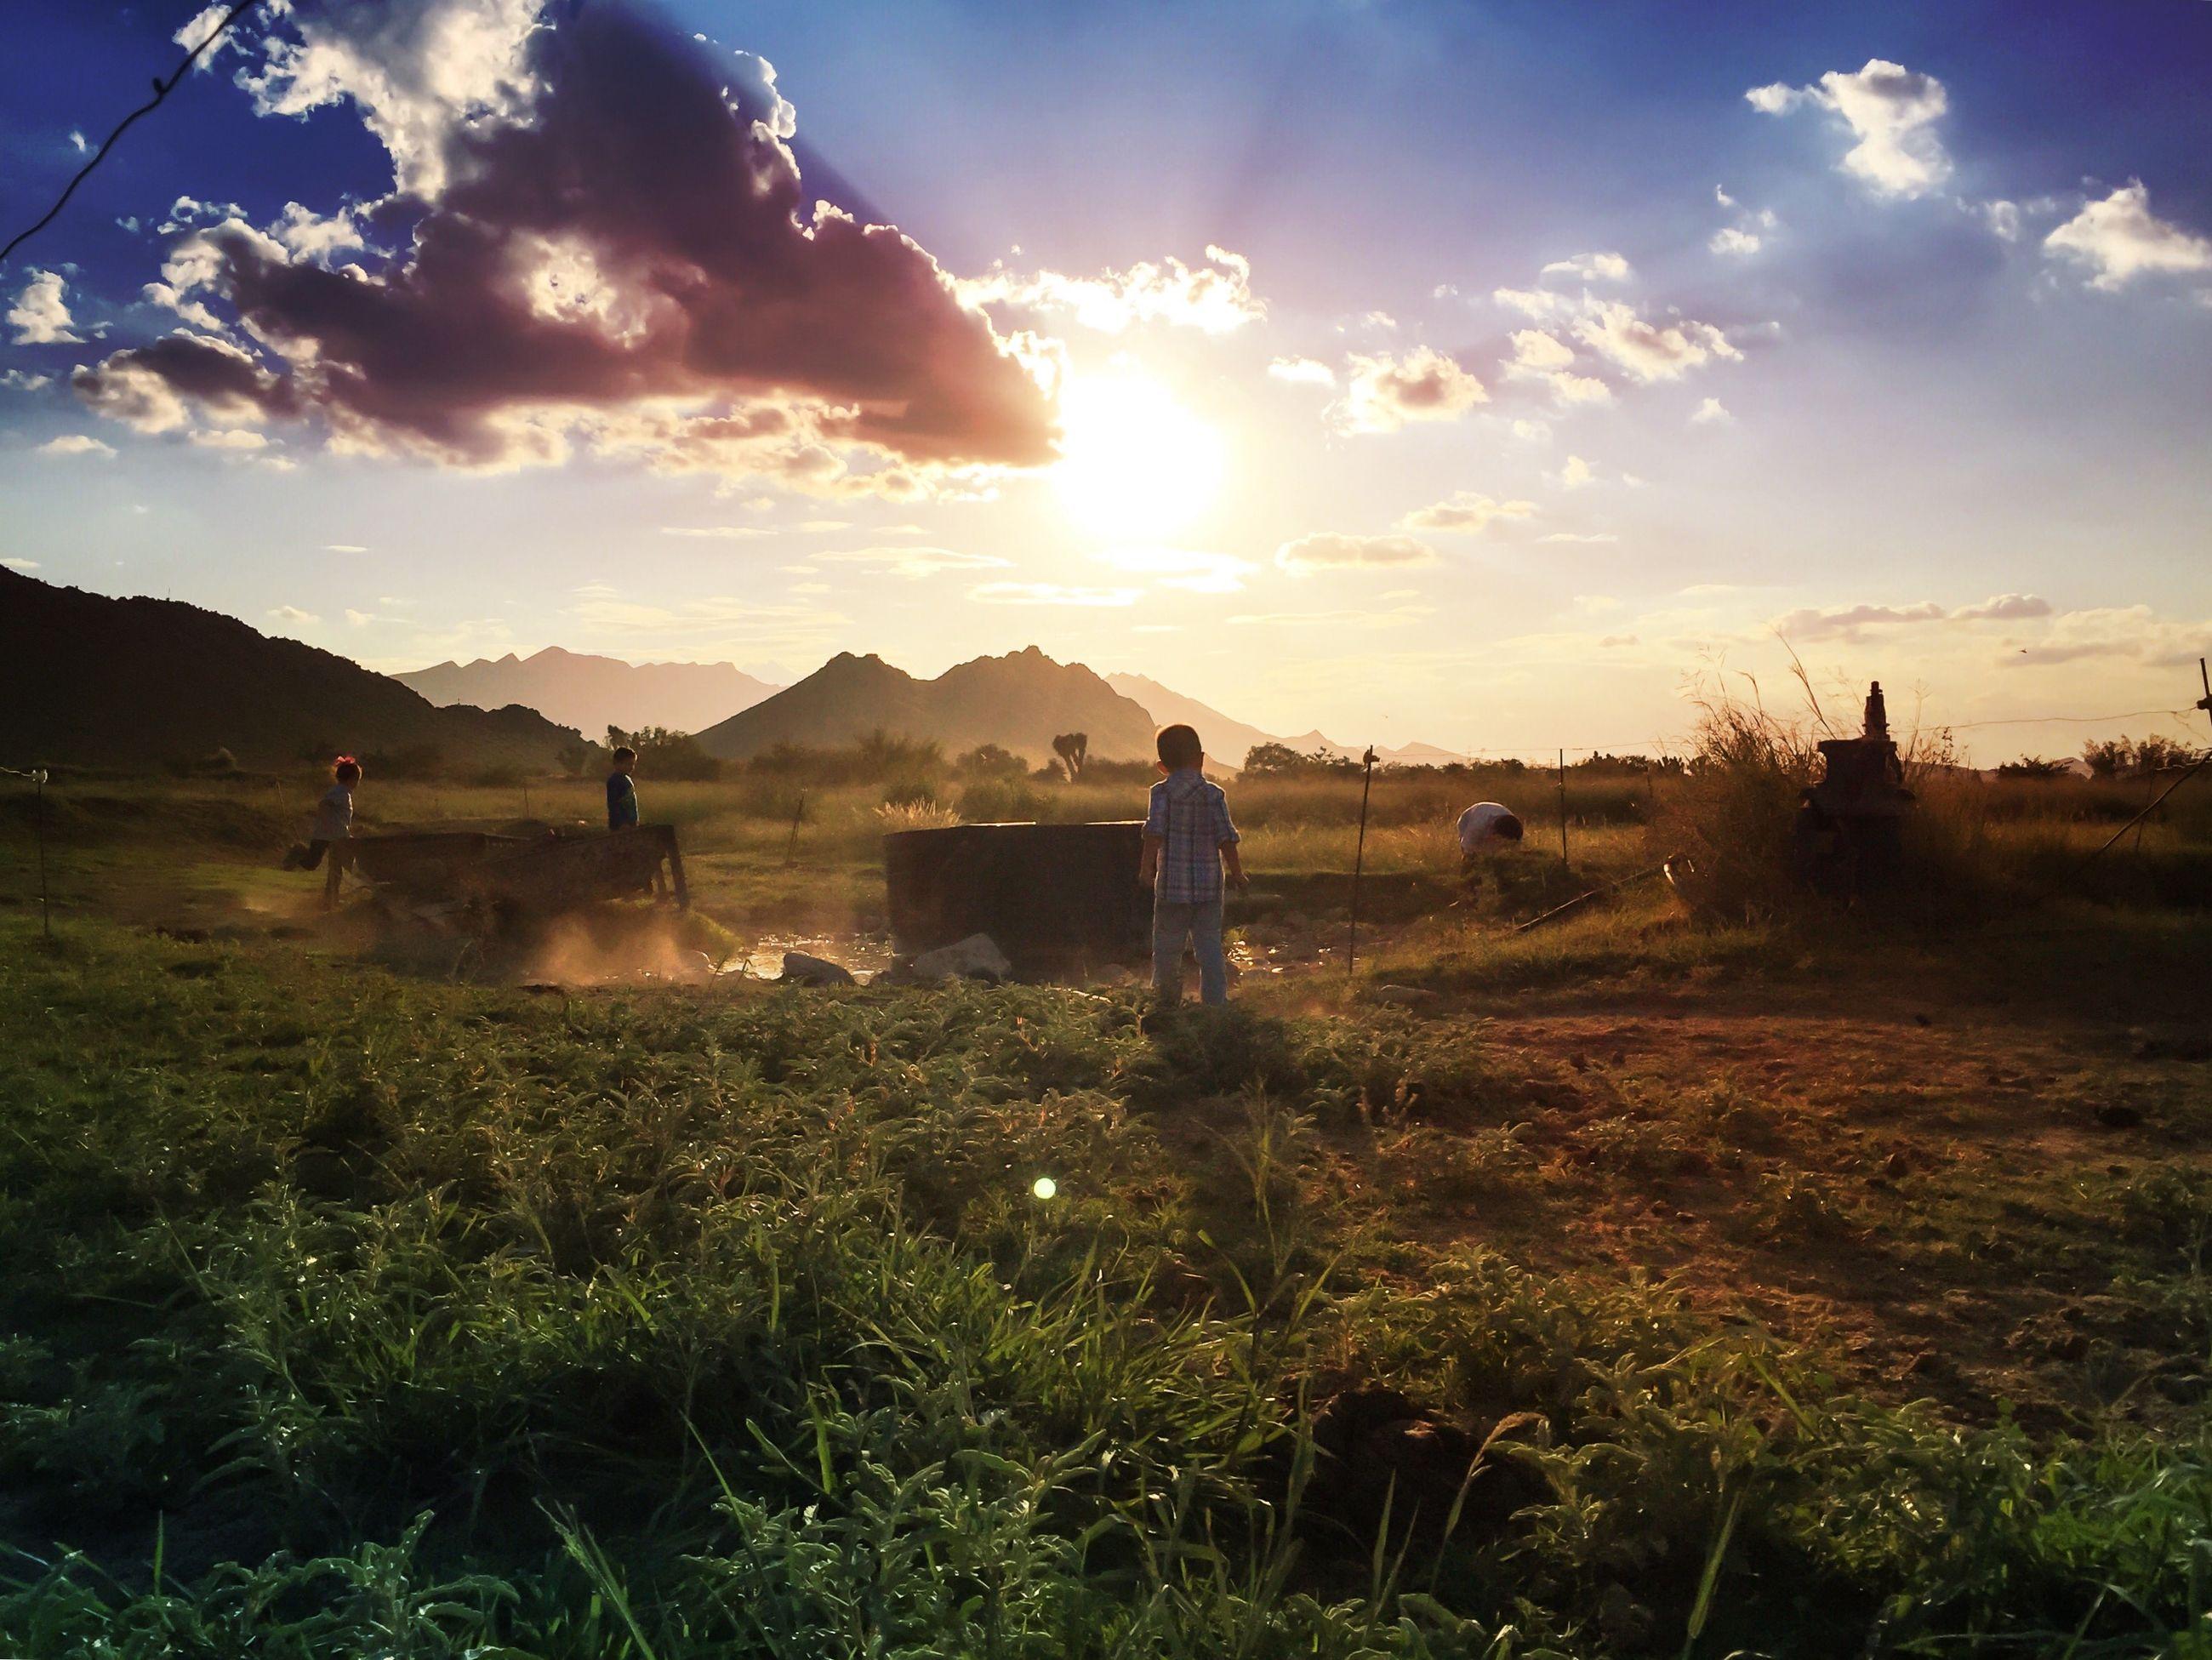 sky, landscape, field, sun, tranquil scene, grass, beauty in nature, scenics, sunlight, tranquility, nature, cloud - sky, sunset, sunbeam, growth, cloud, lens flare, tree, plant